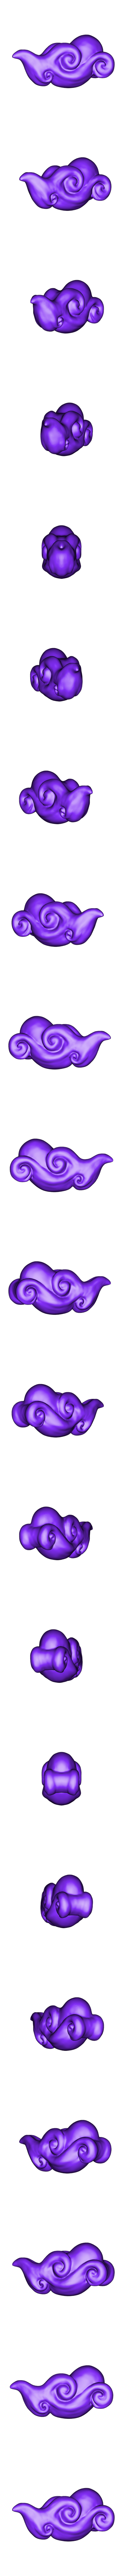 Cloud_006.stl Download STL file Asian Cloud n°6 • 3D printable template, LeKid